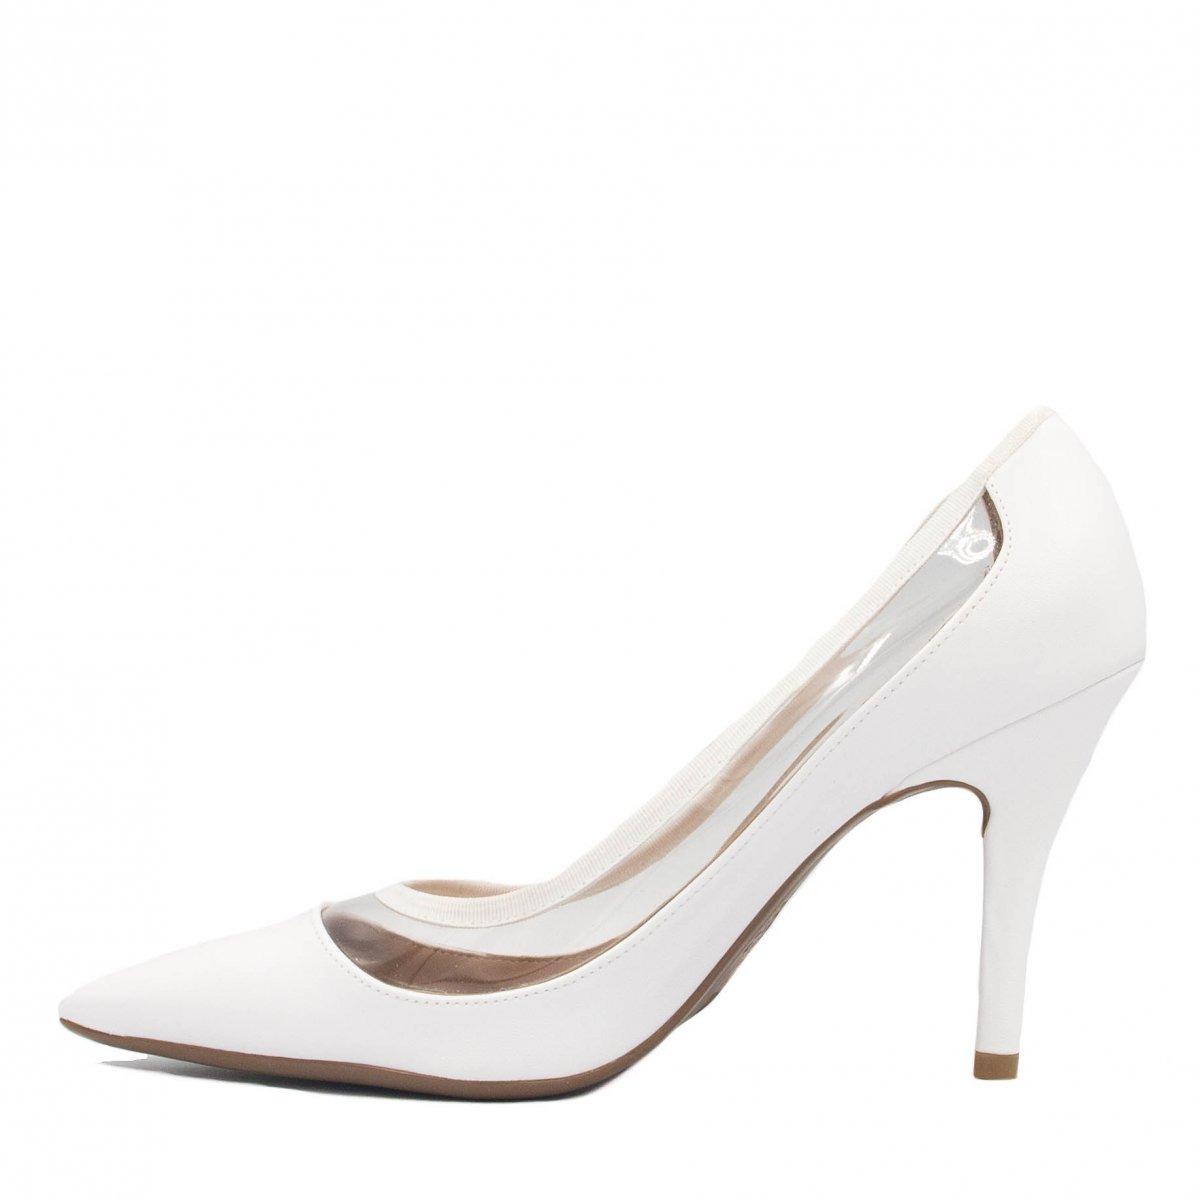 47517e0319 sapato de noiva vizzano scarpin vinil branco 1184.186. Carregando zoom.